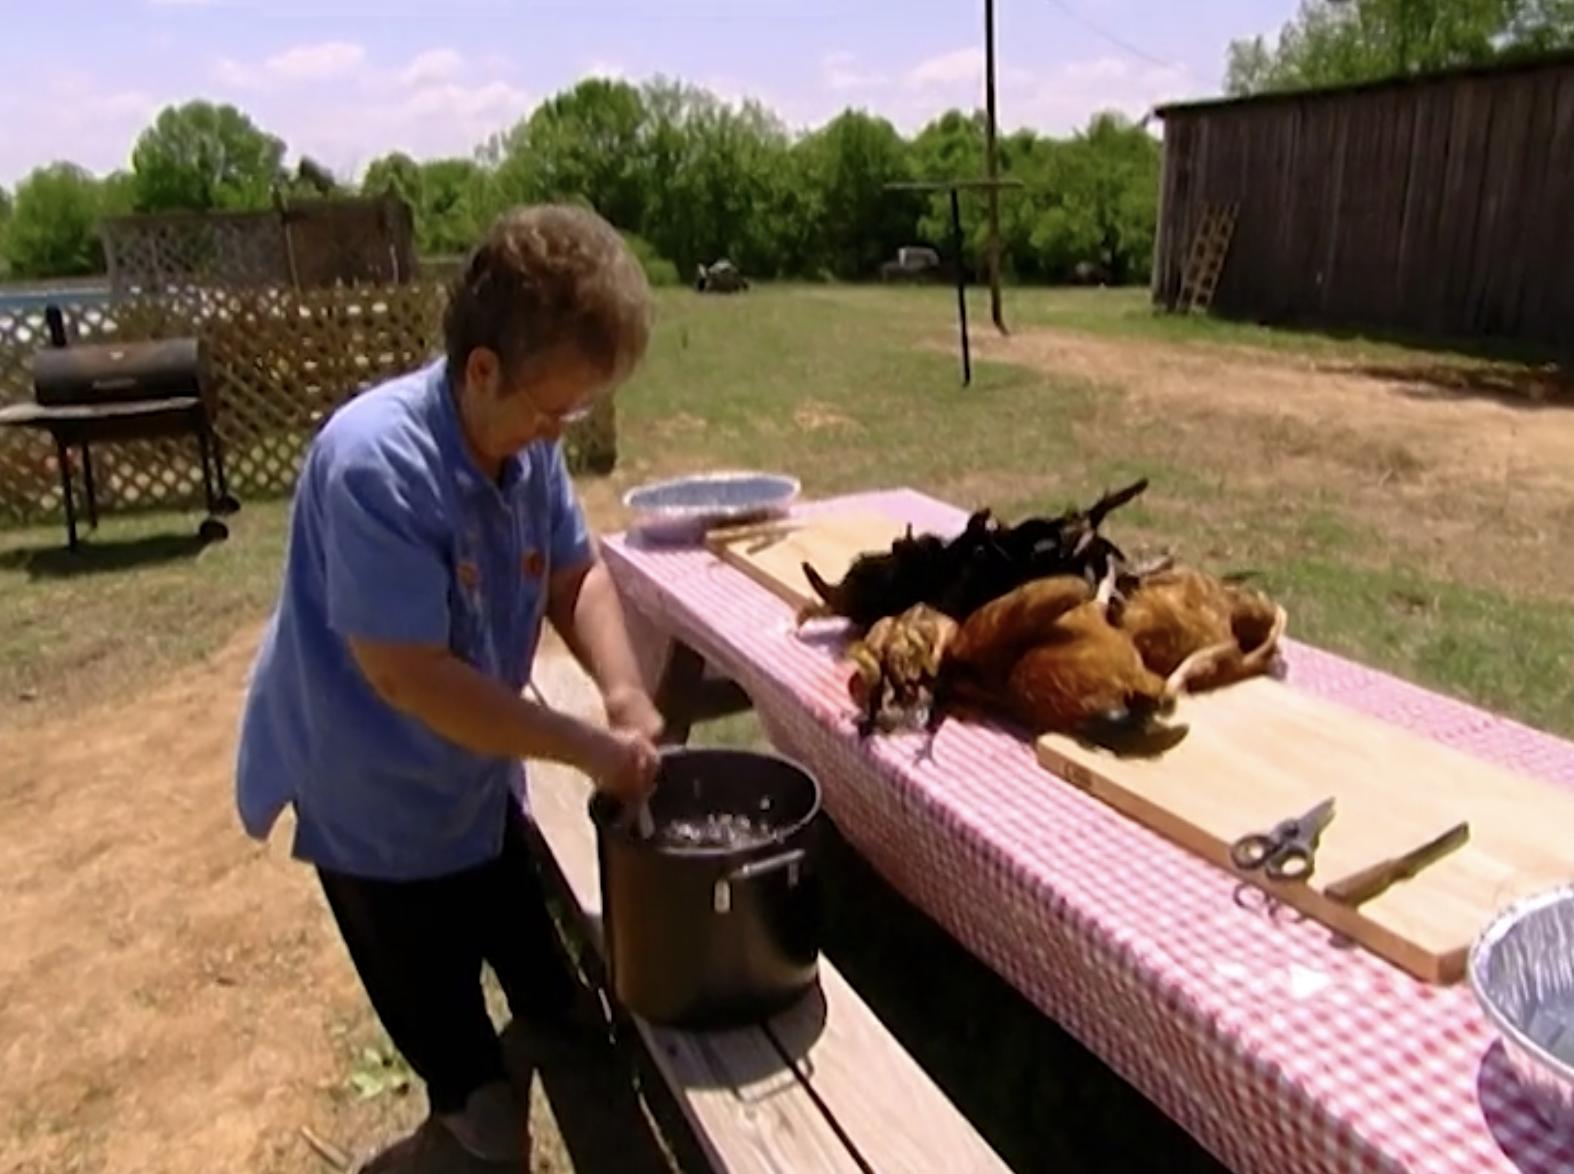 Grandma preparing fresh chickens for plucking.